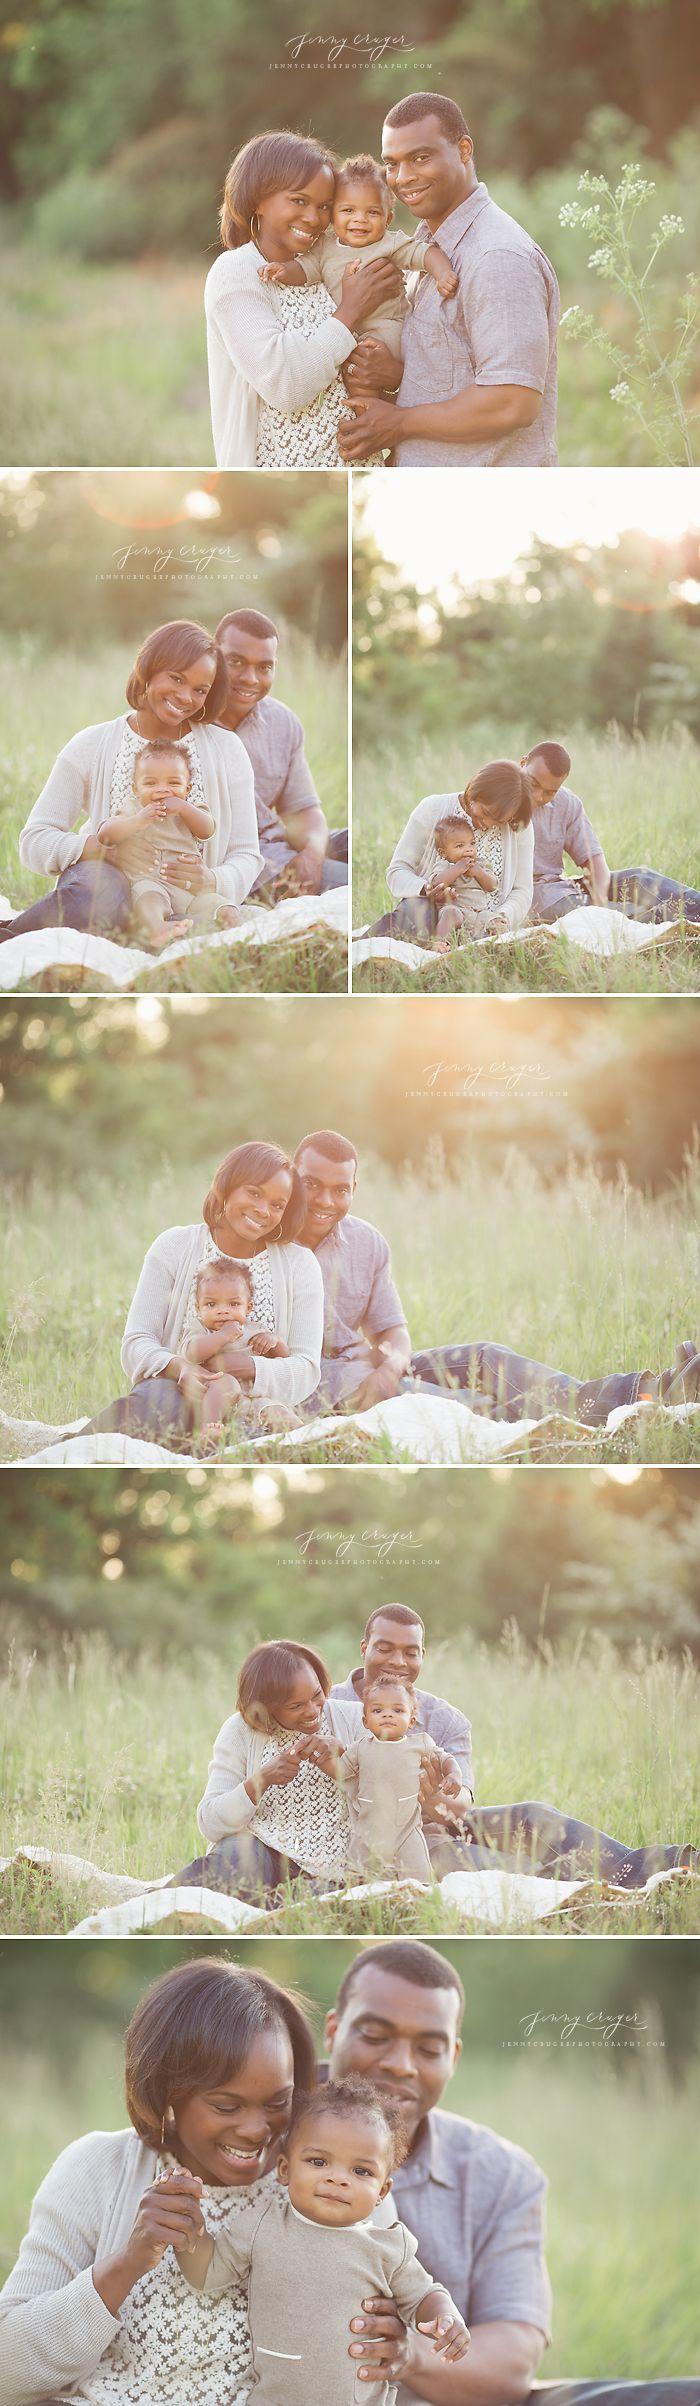 jenny cruger photography   nashville family photographer